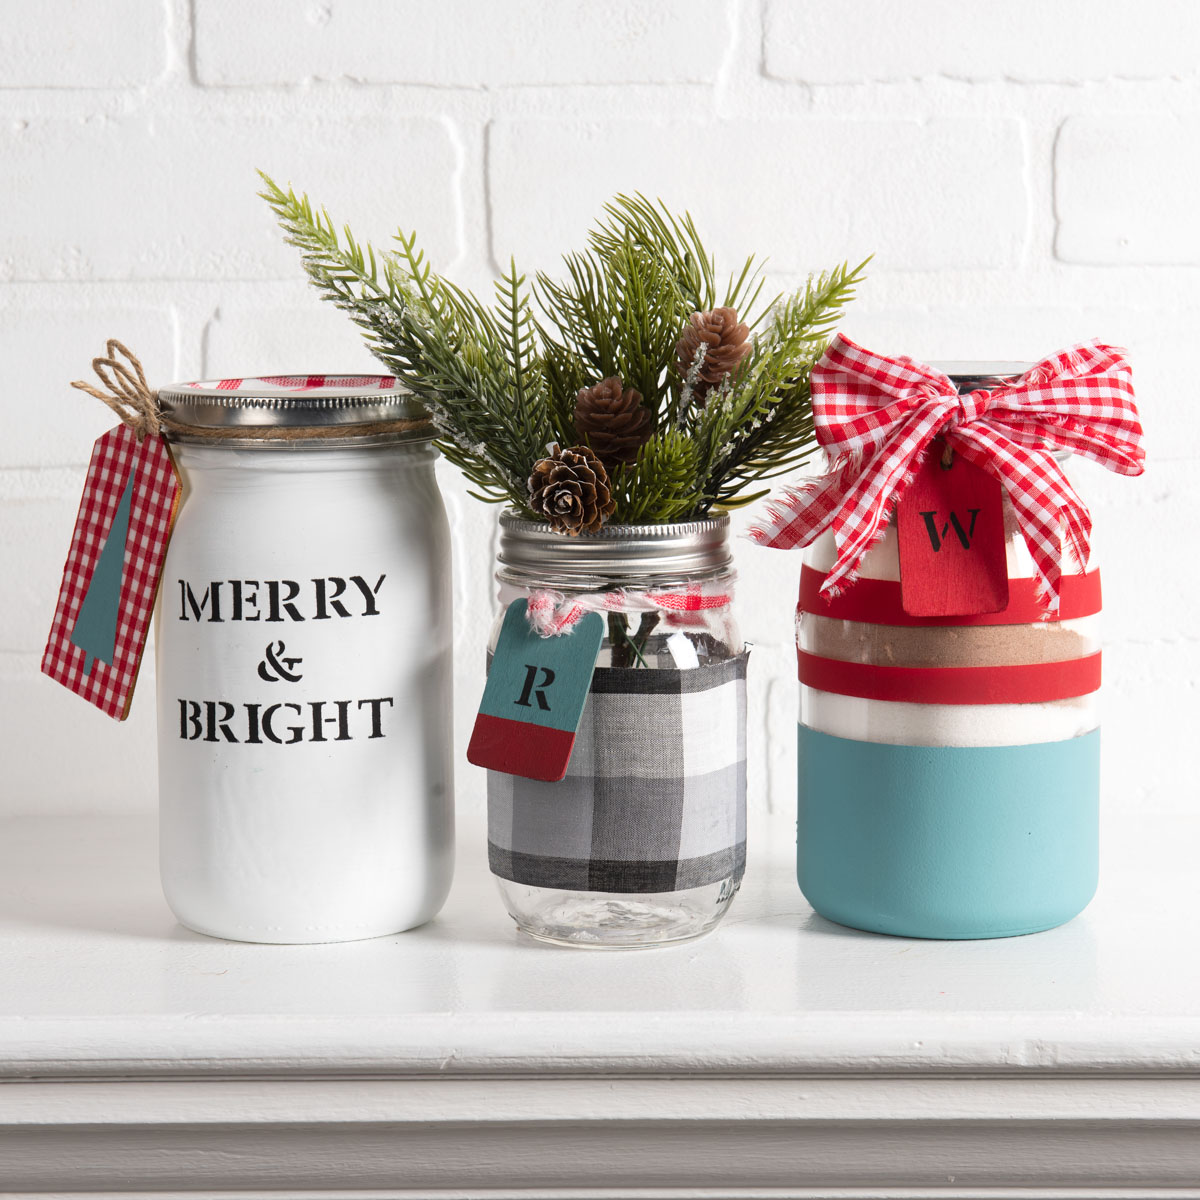 Frascos pintados para presente de Natal